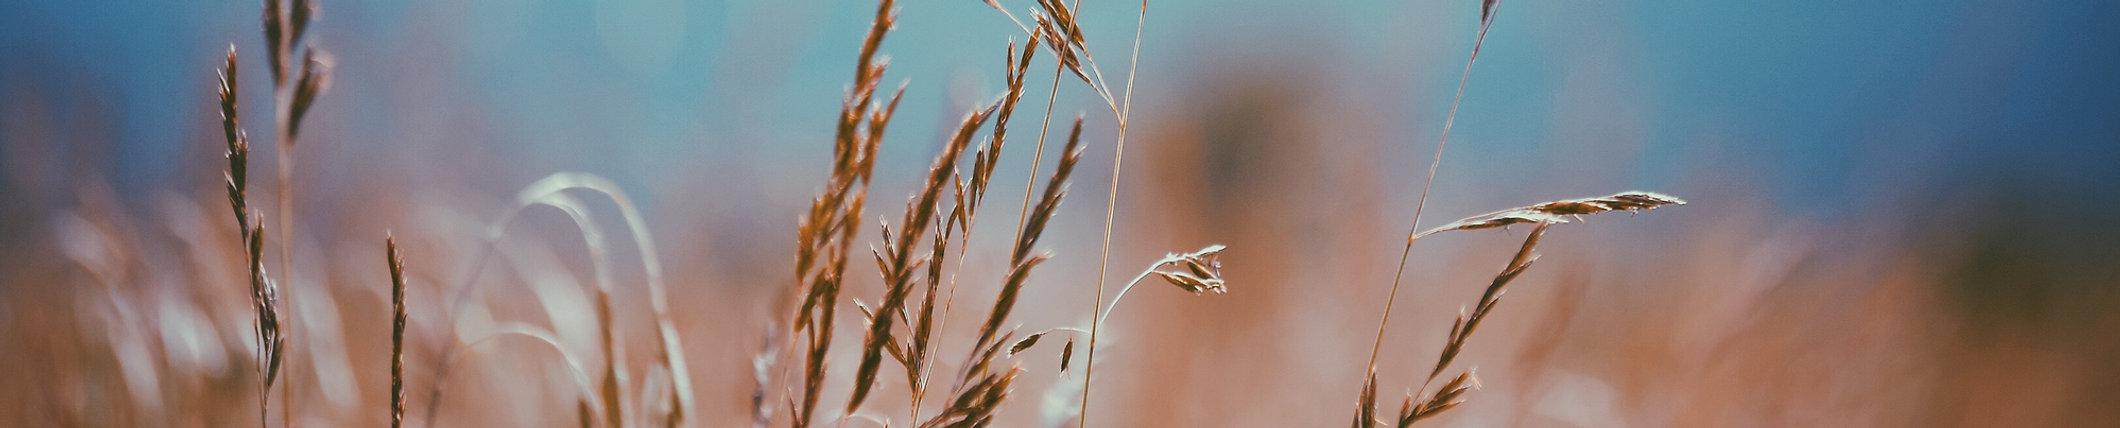 sementi, cereali, materie prime di alta qualità